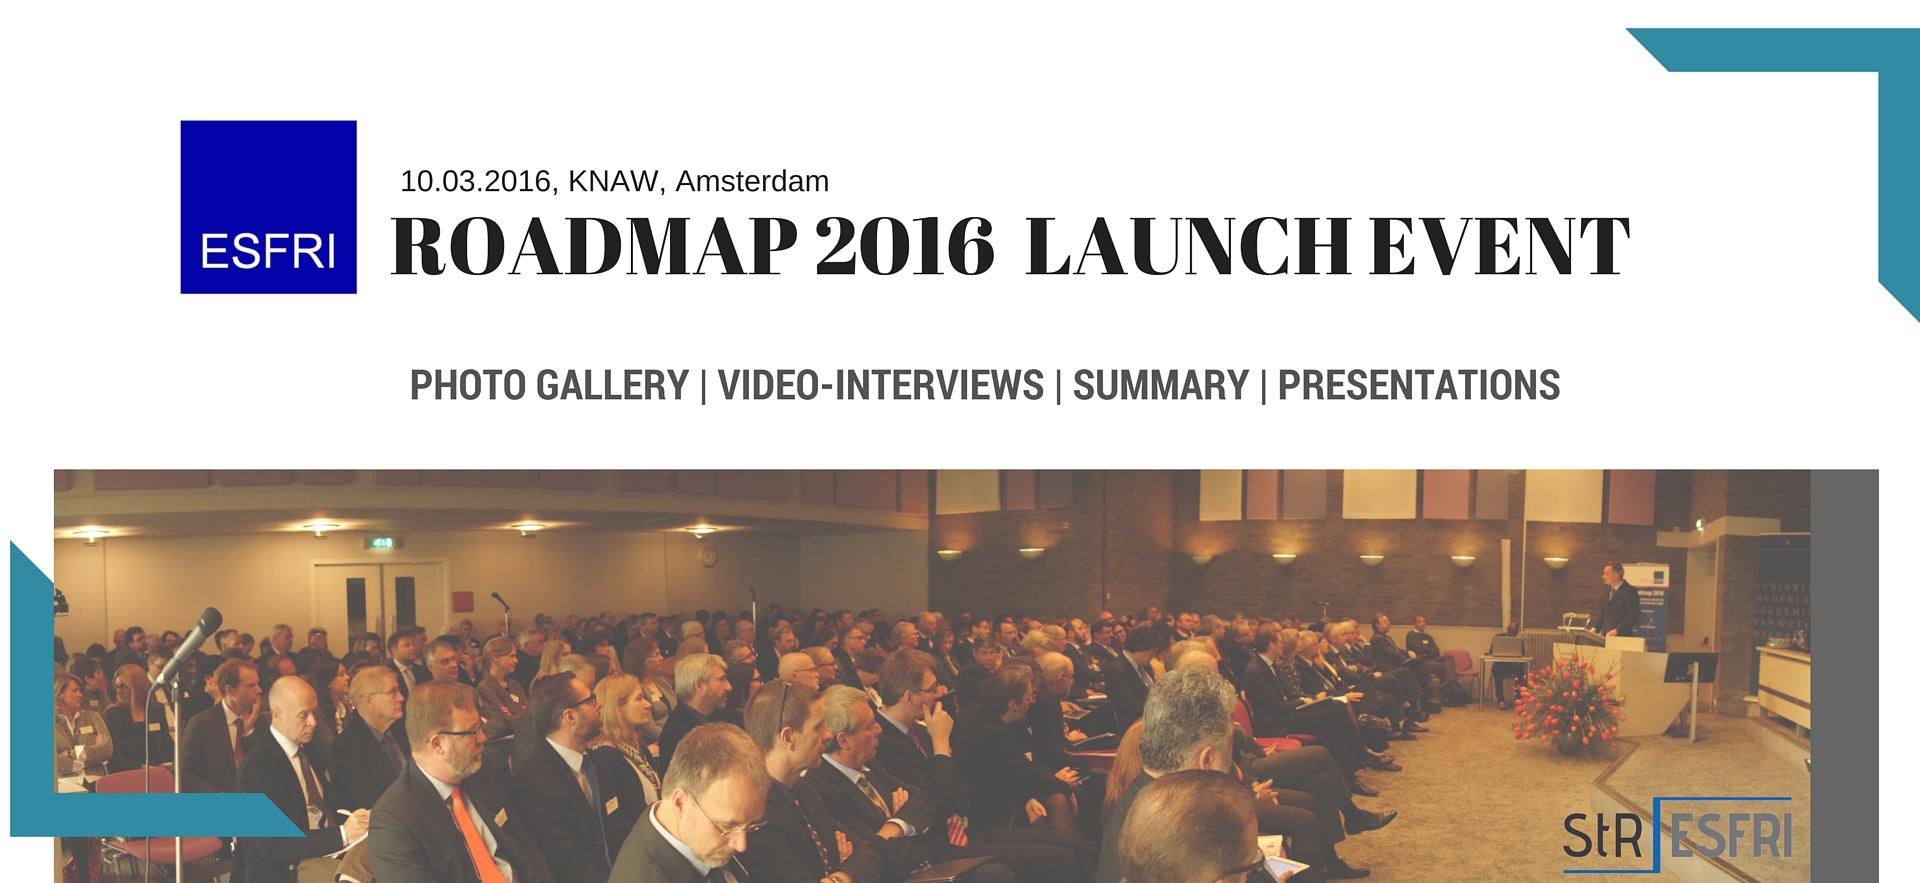 2016 ROadmap launch event 3.jpg